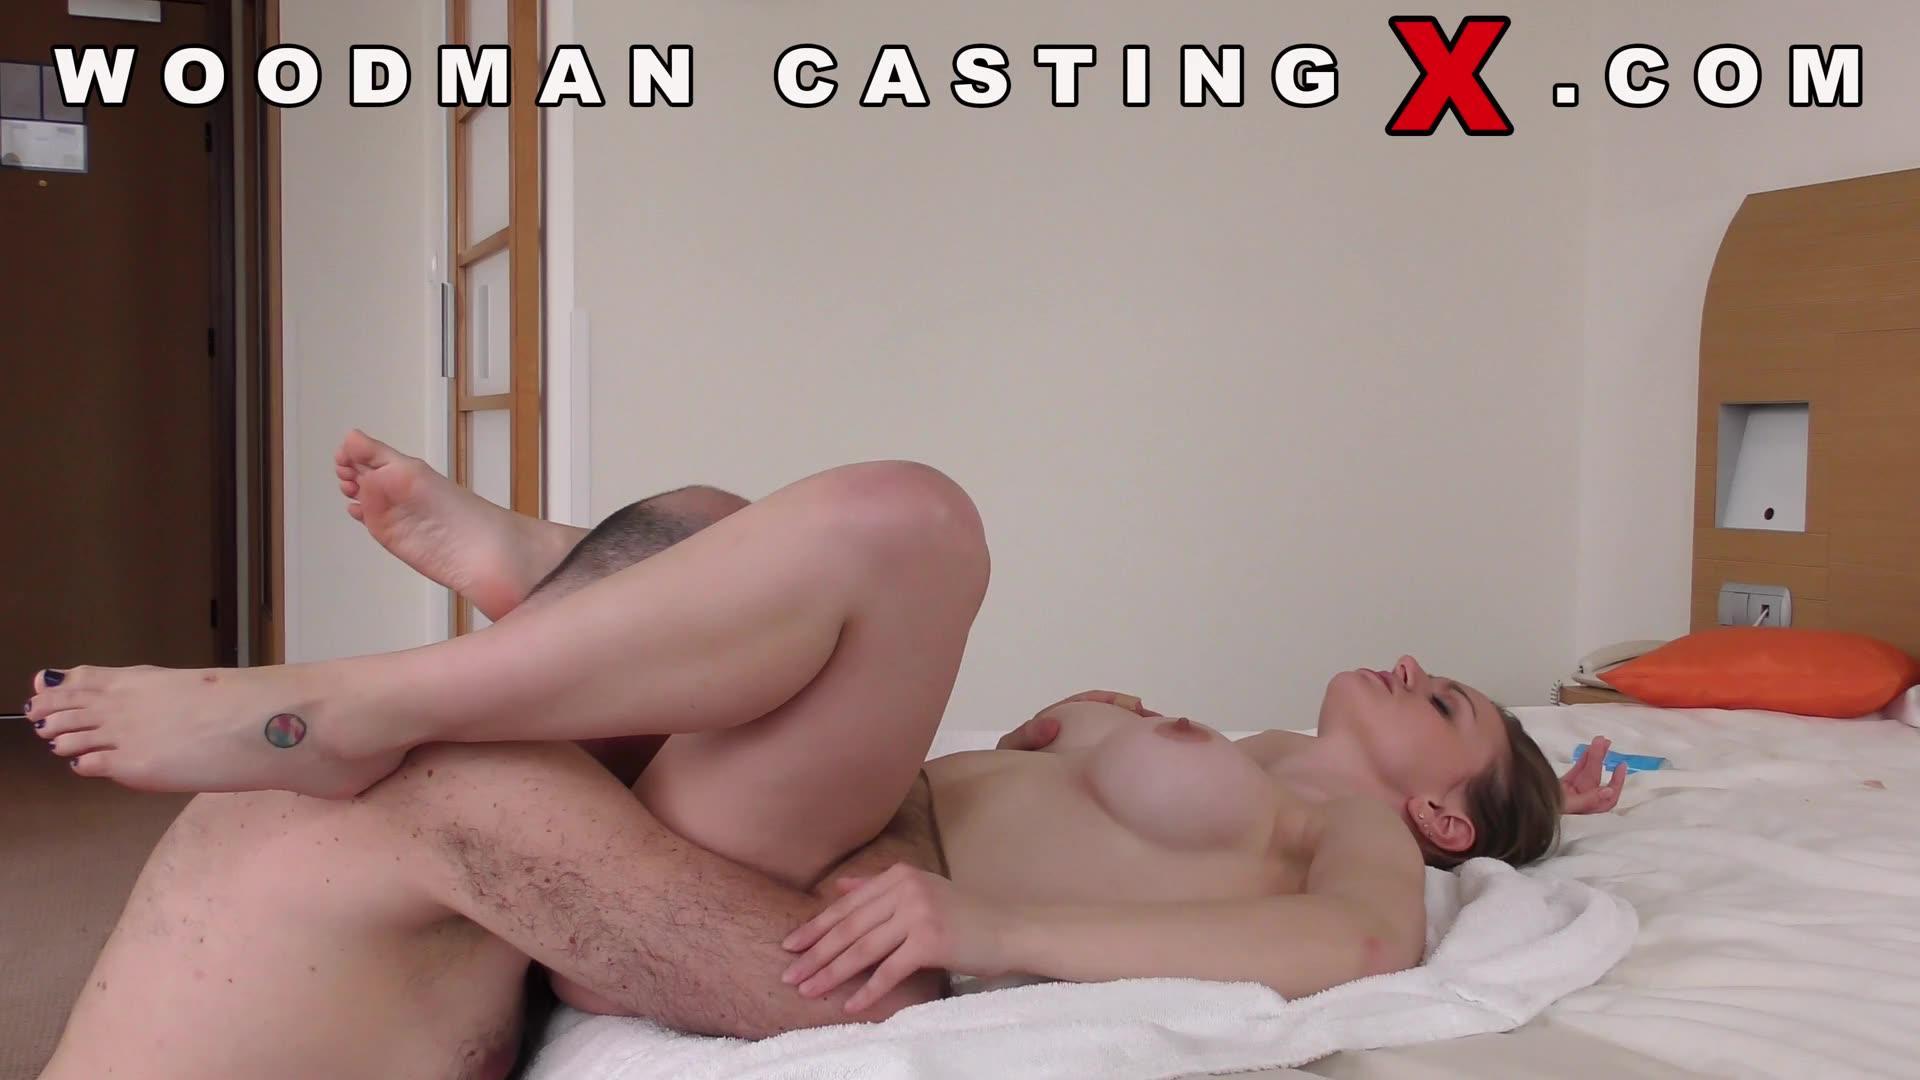 Alexandra Fox Videos Porno excellent collection of porn videos (updated) [720p/1080p